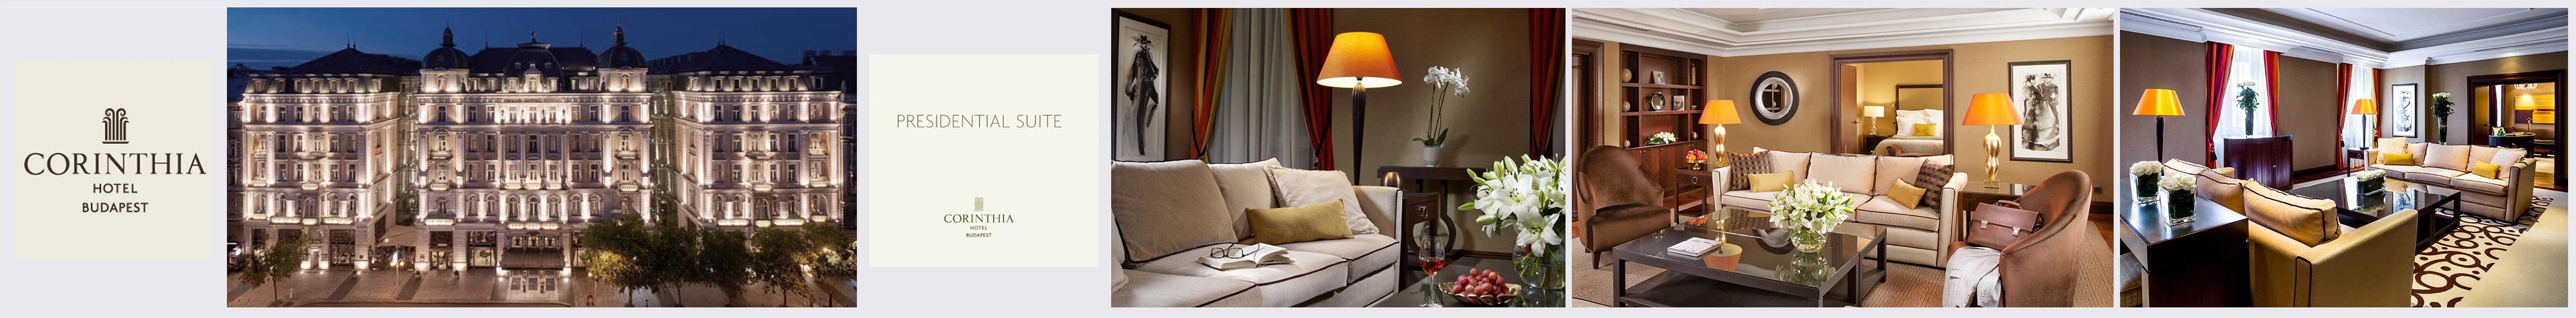 Presidential Suite  Corinthia Hotel Budapest